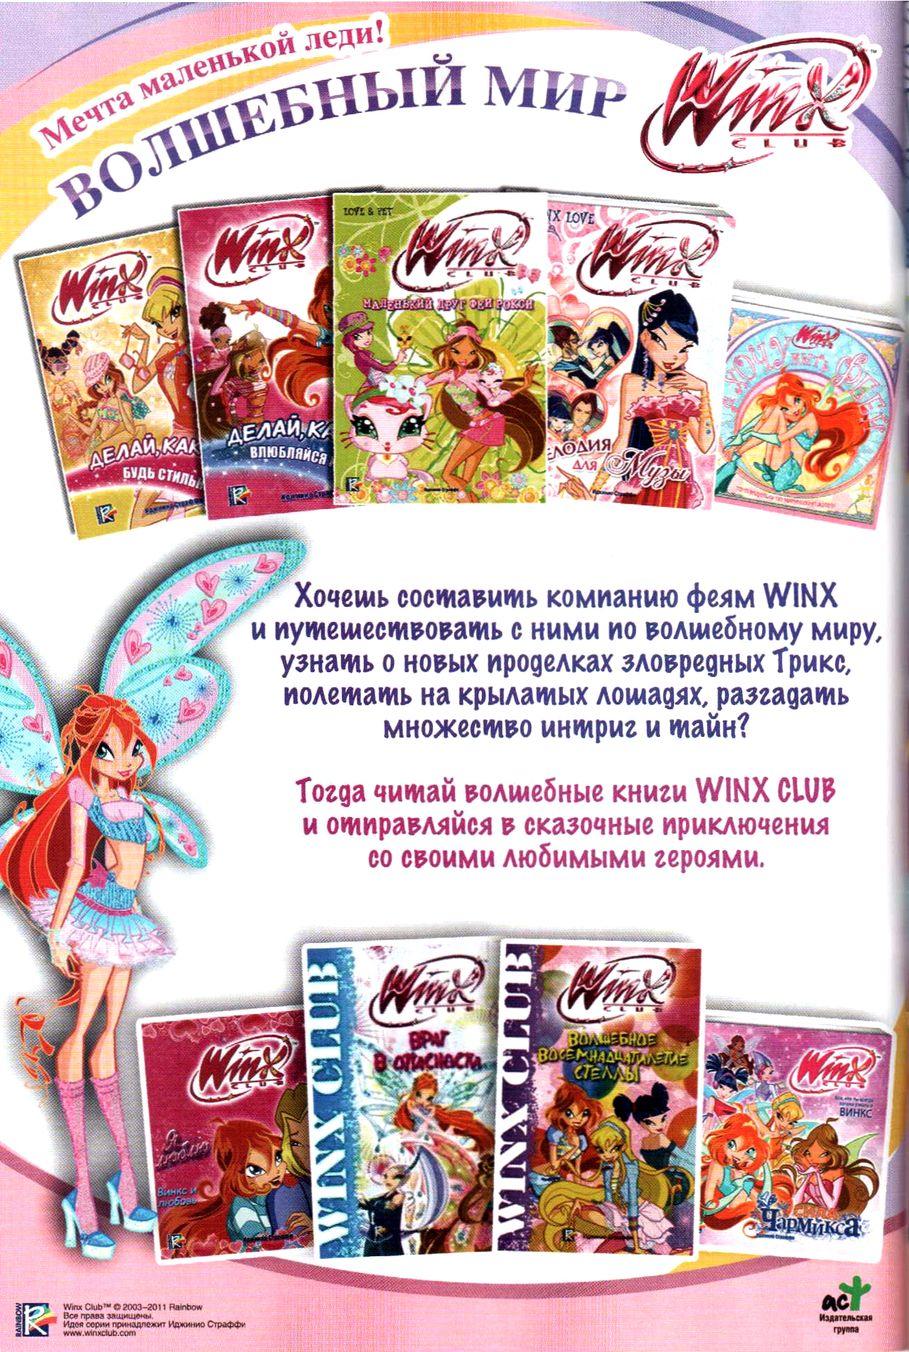 Комикс Винкс Winx - Любовь и ревность (Журнал Винкс №7 2011) - стр. 14